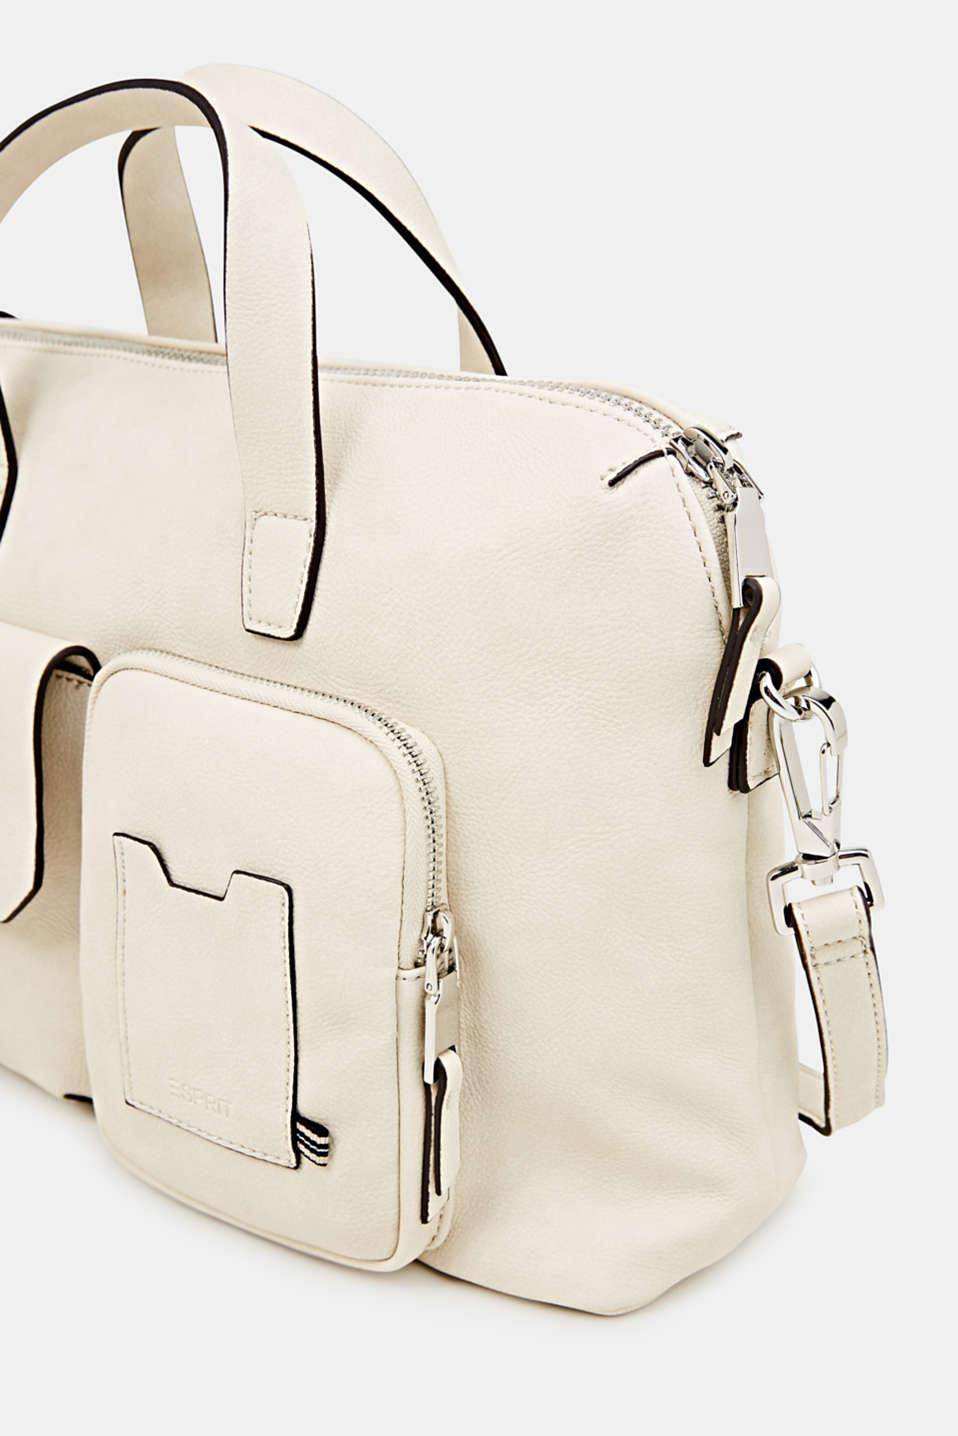 Faux leather handbag, CREAM BEIGE, detail image number 3